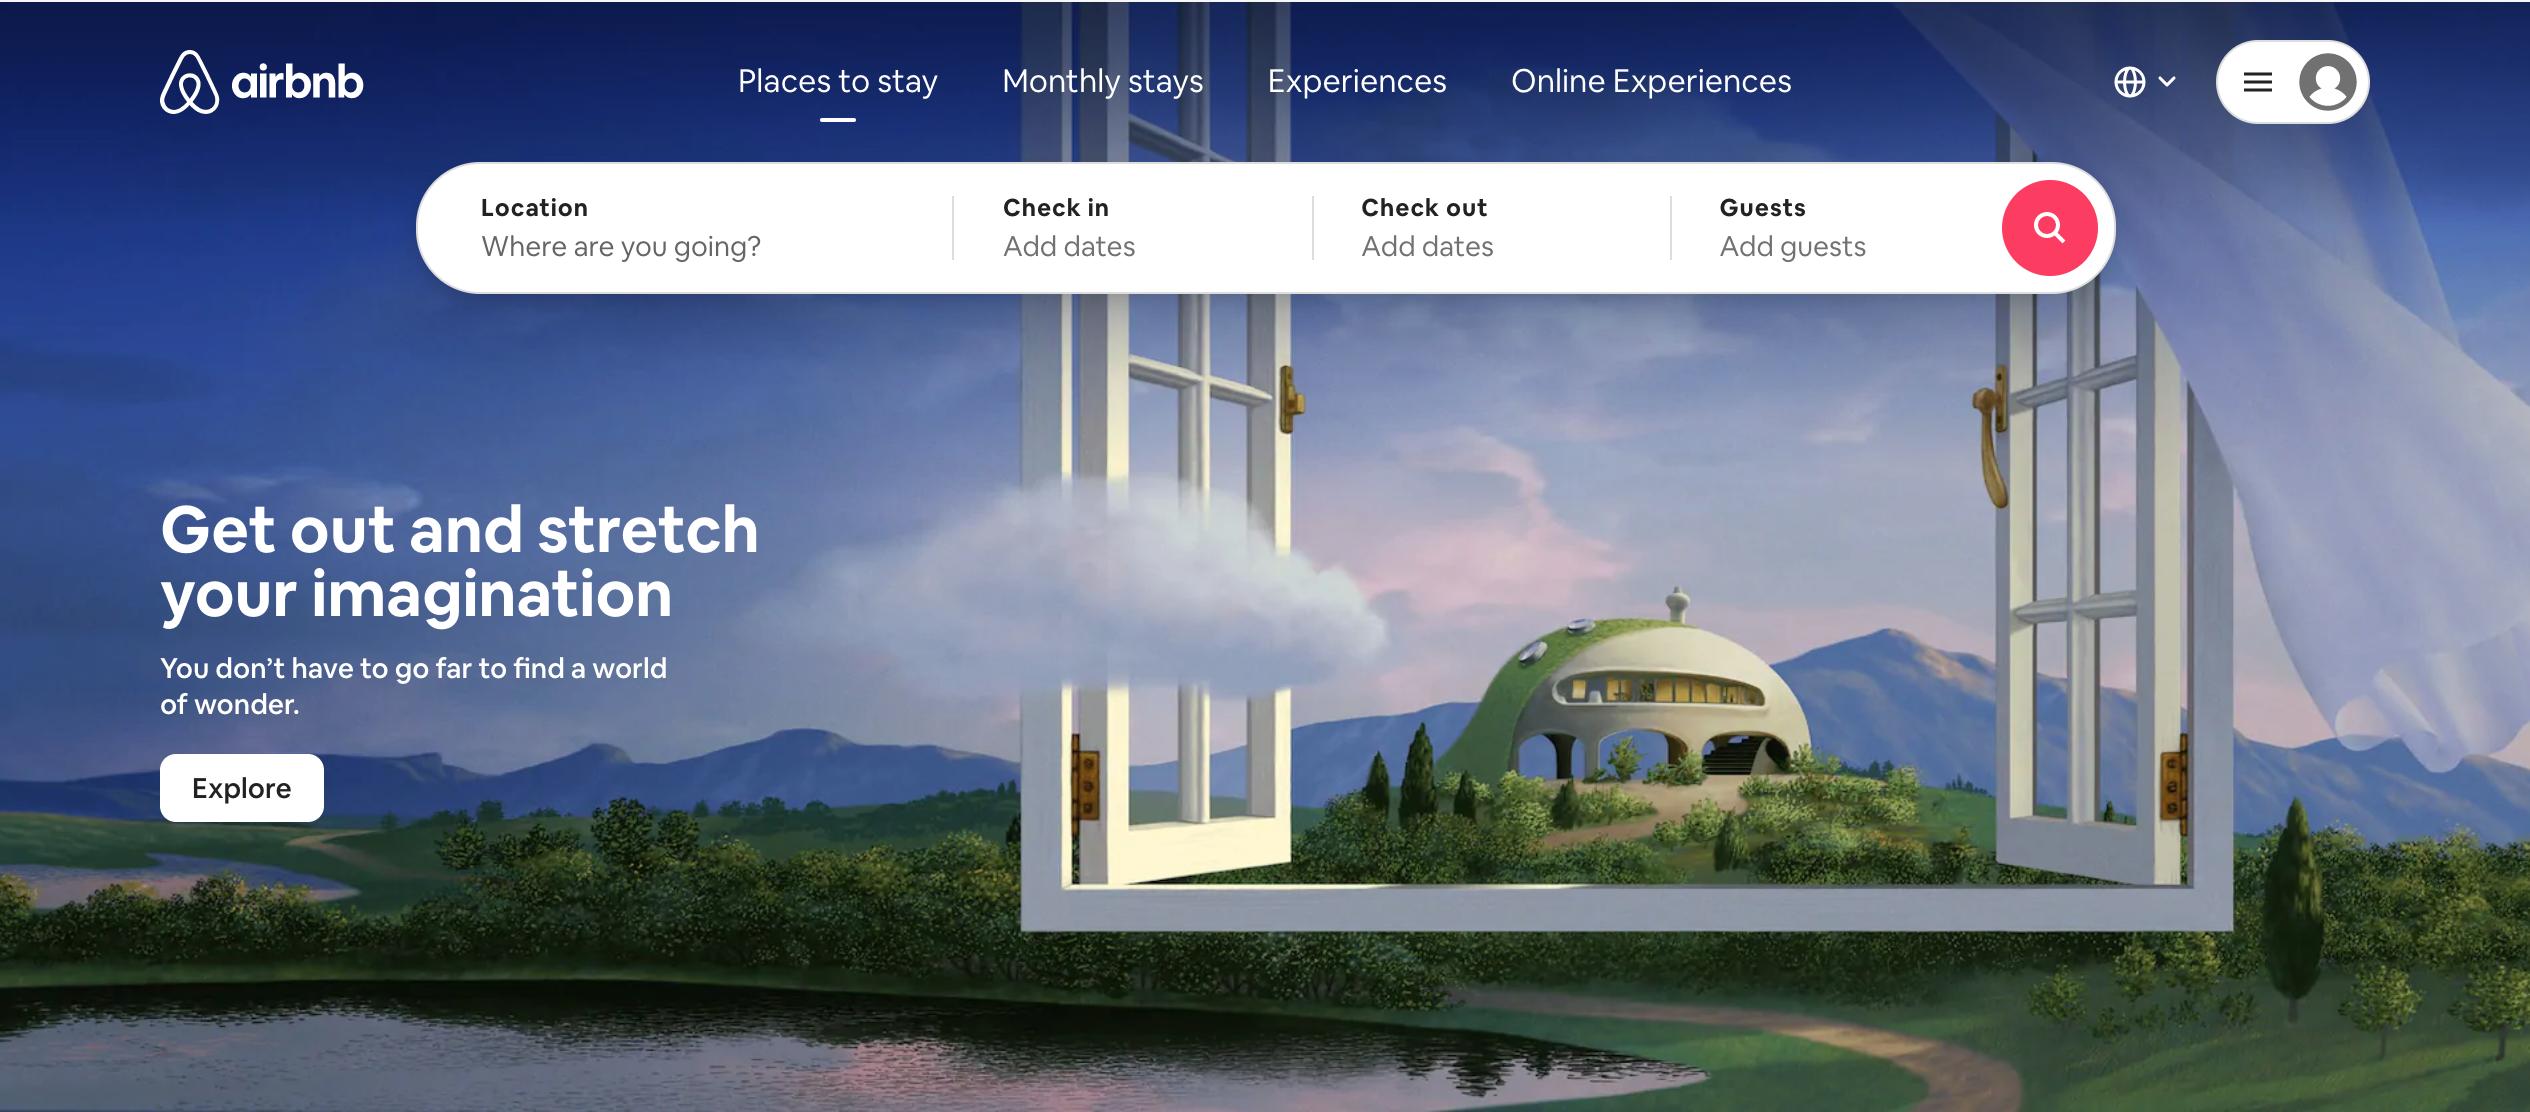 Airbnb User Interface Landing Page In 2020 Homepage Design Wellness Design Software Development